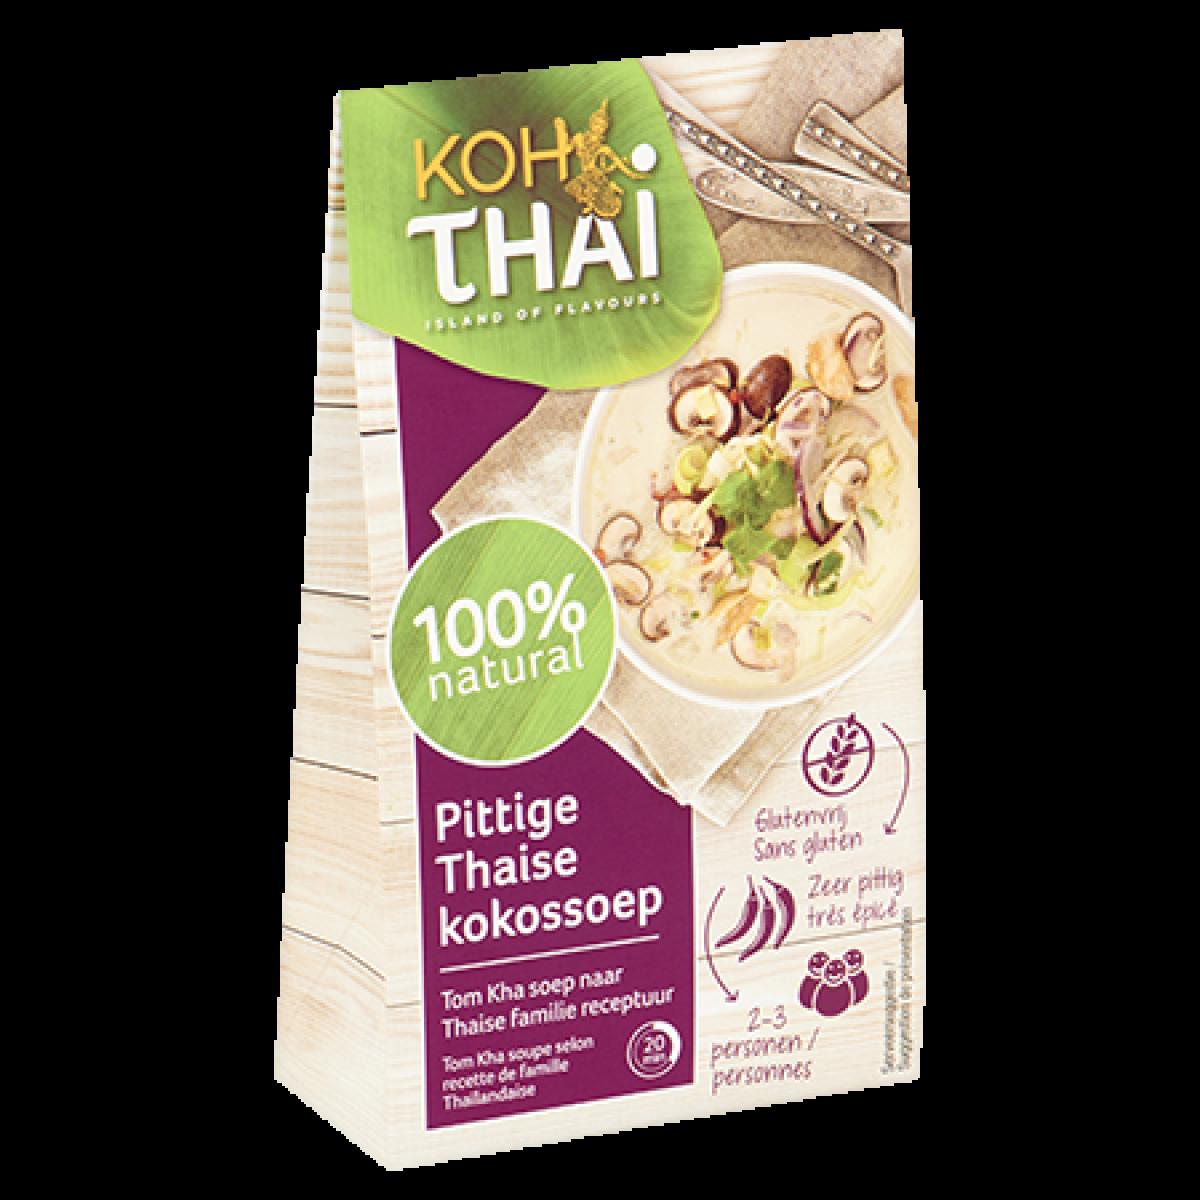 Pittige Thaise Kokossoep (Tom Kha)